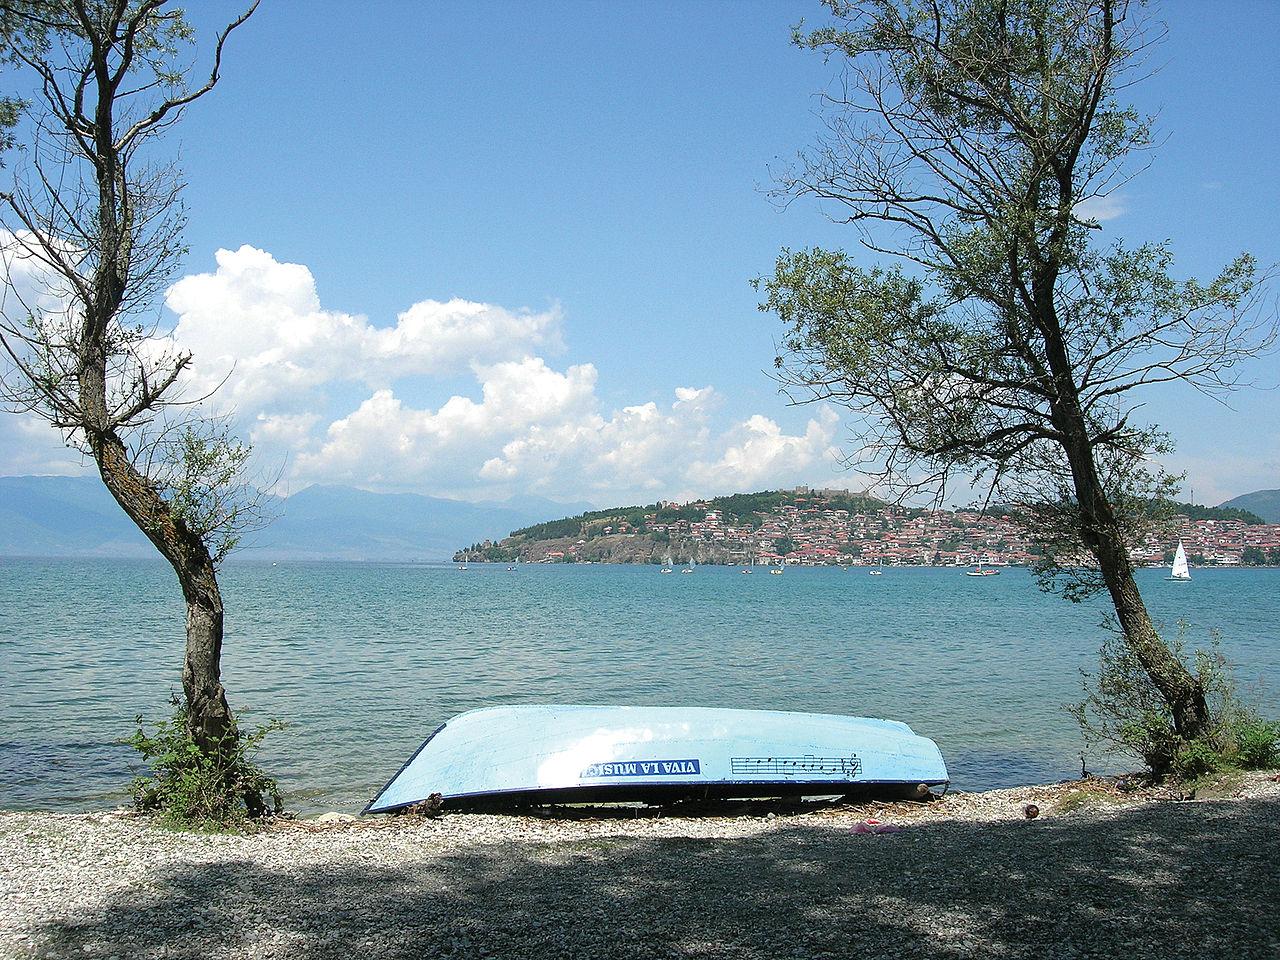 Охридское озеро, на берегу